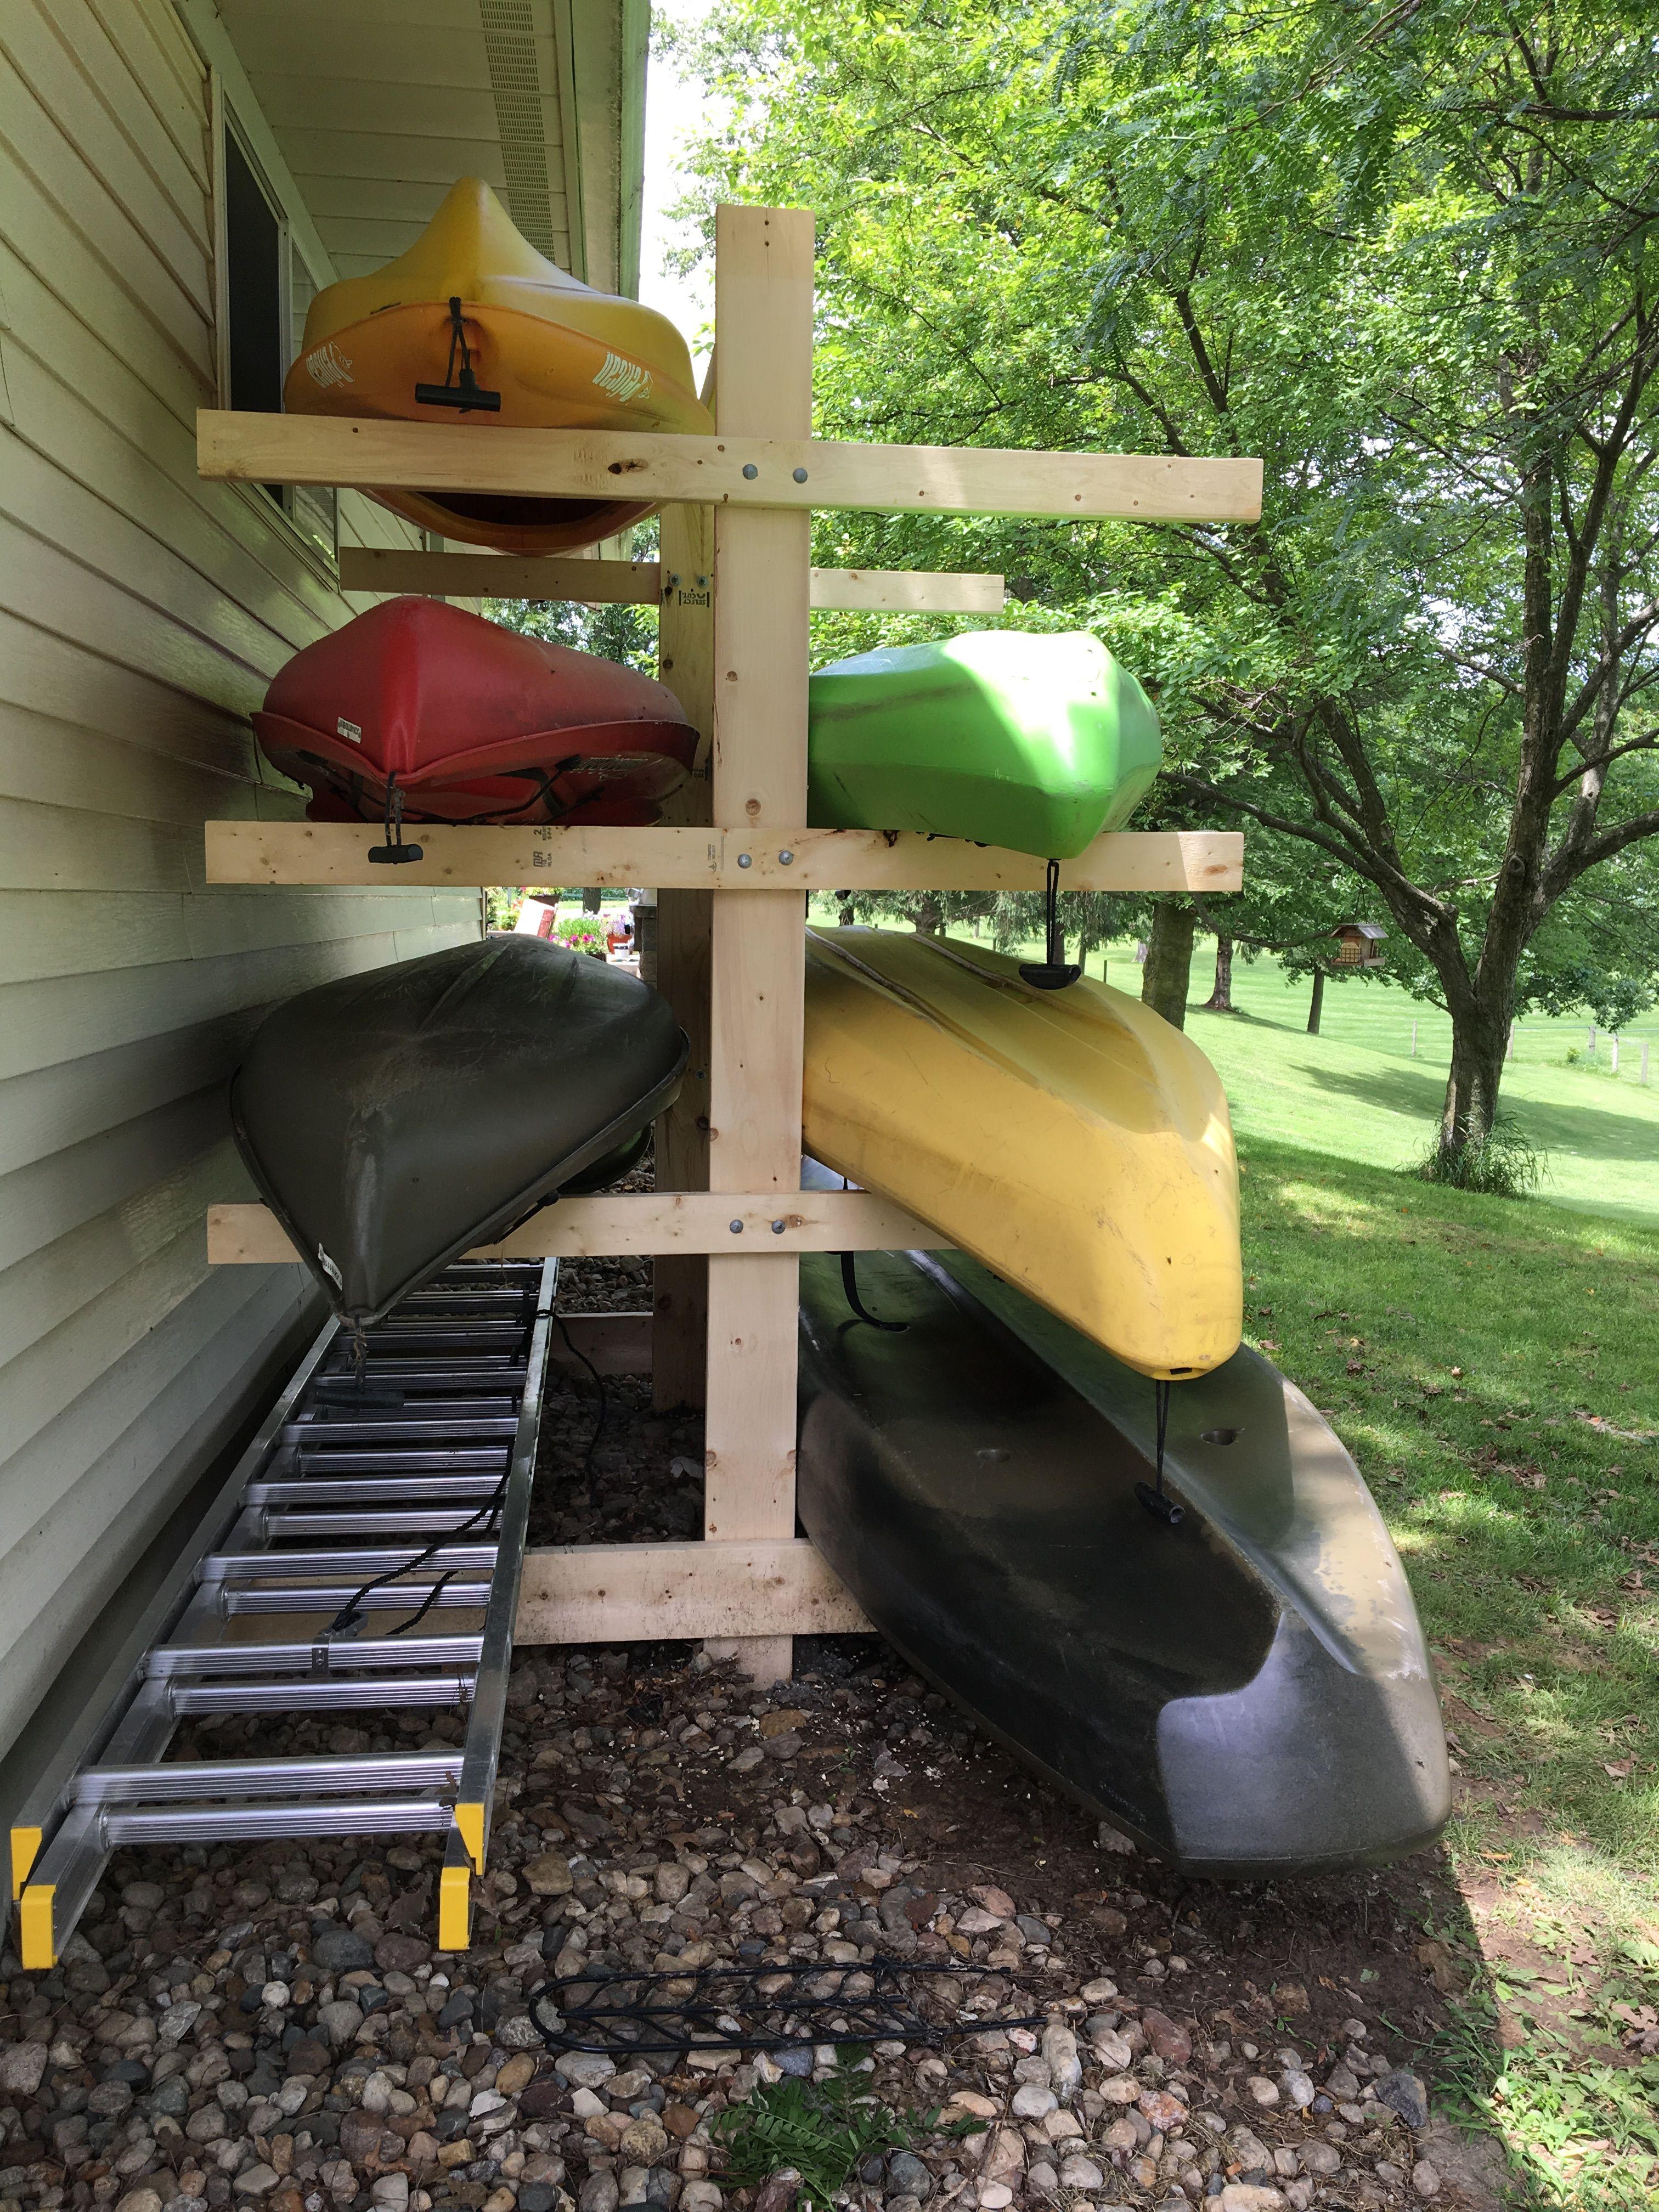 Kayak Rack Kayak Storage Rack Diy Kayak Storage Kayak Storage Diy backyard kayak rack